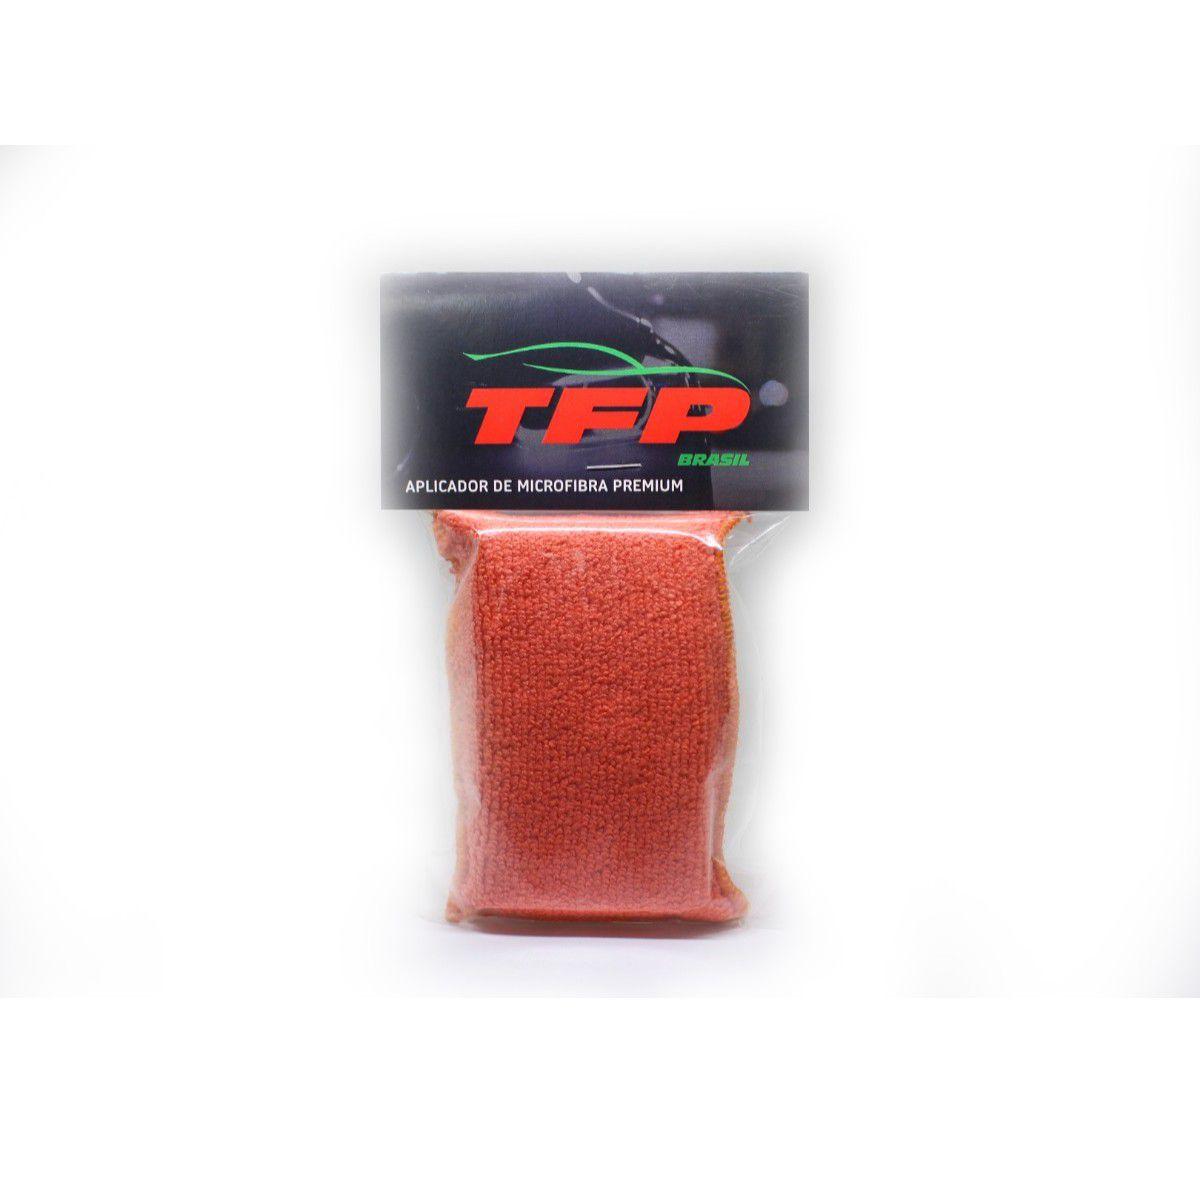 Protelim Protegel 3,1l Super Silicone Em Gel Alto Rendimento + Brinde Aplicador Microfibra